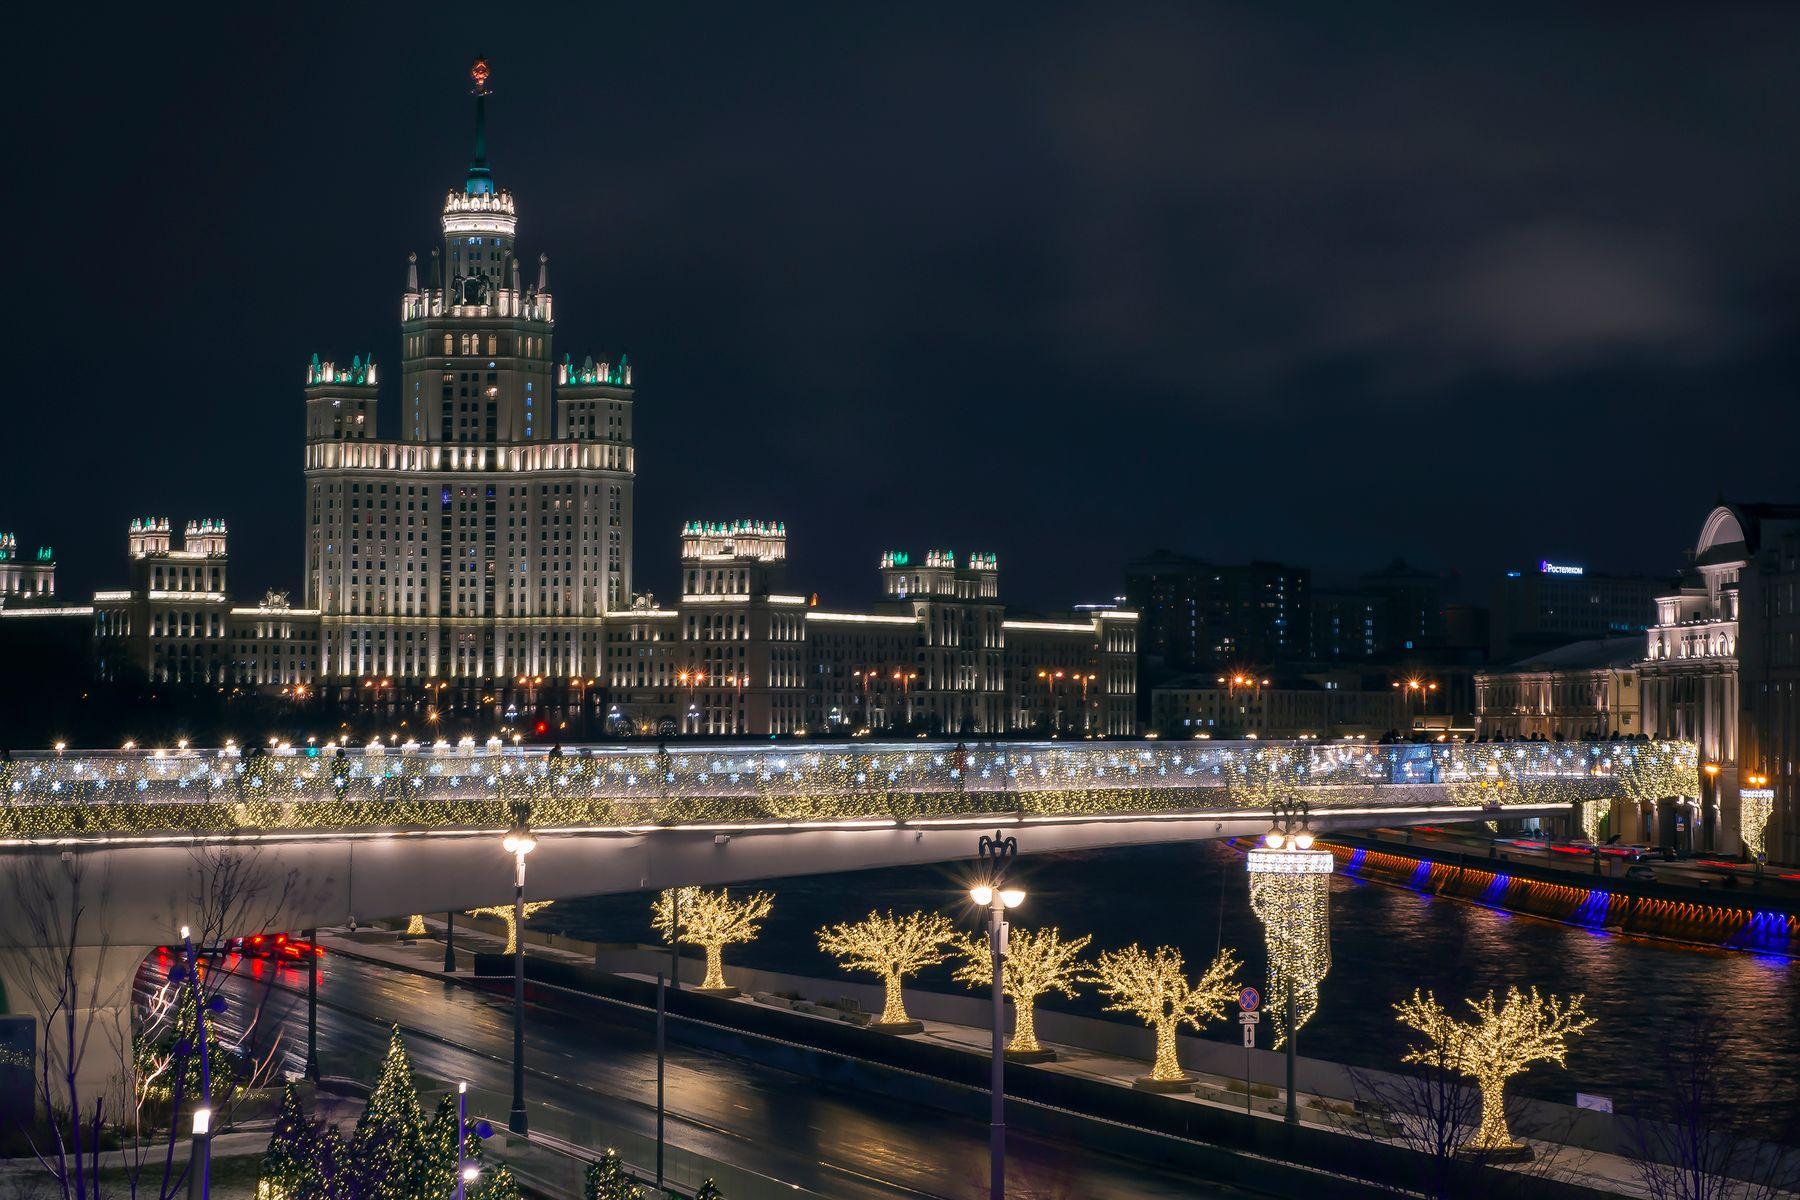 Праздничная иллюминация город праздник иллюминация